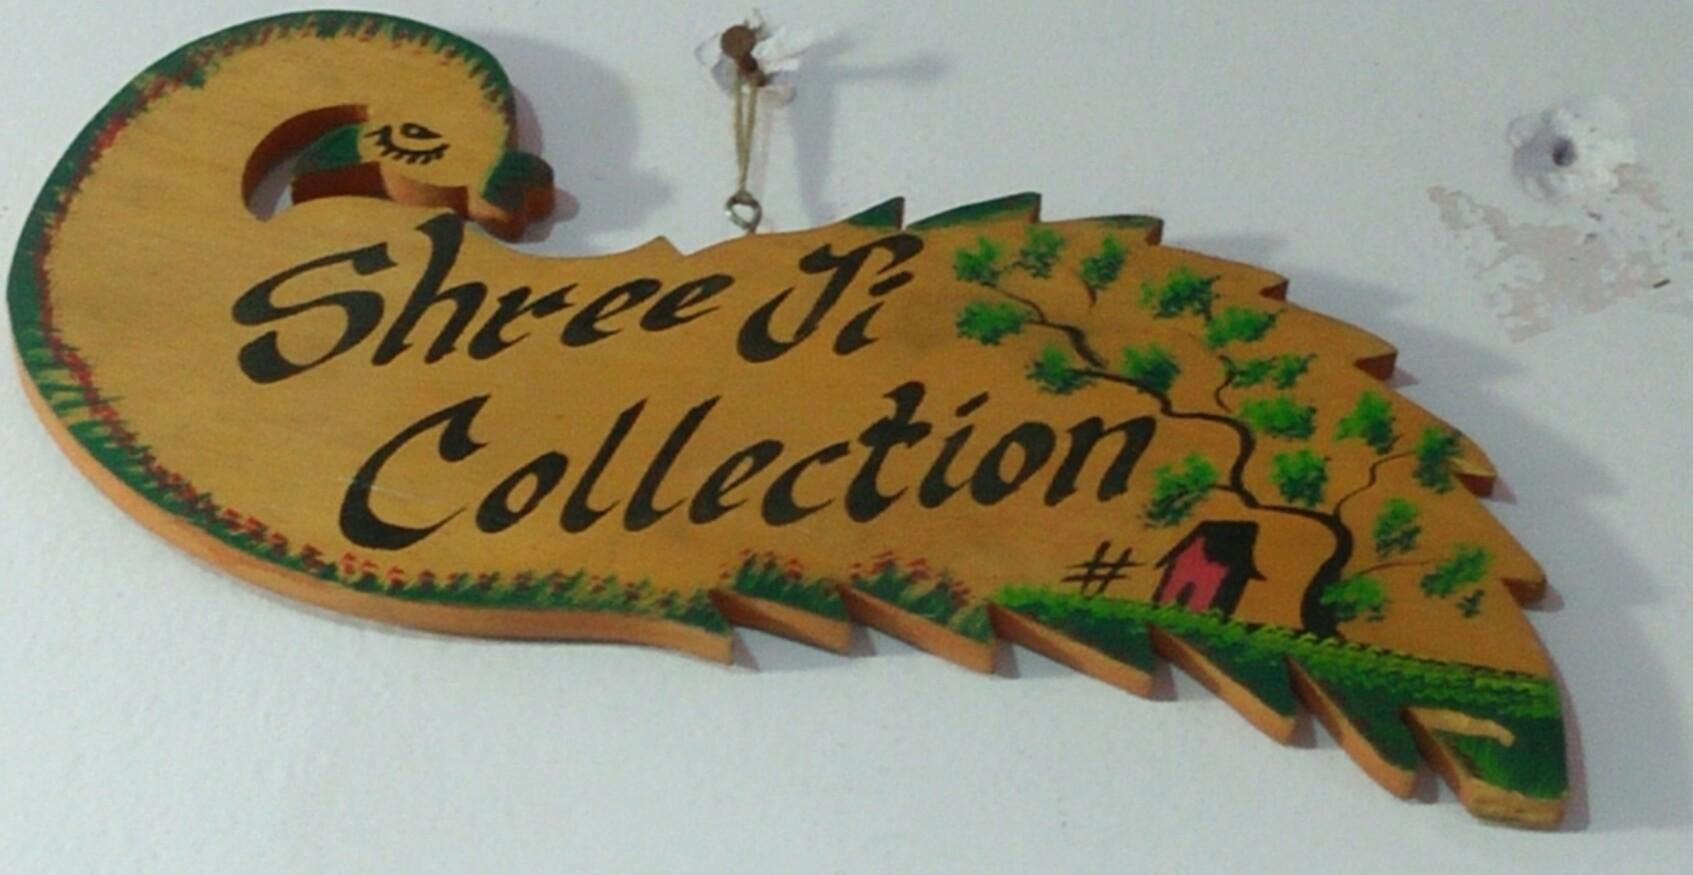 Shree ji collection